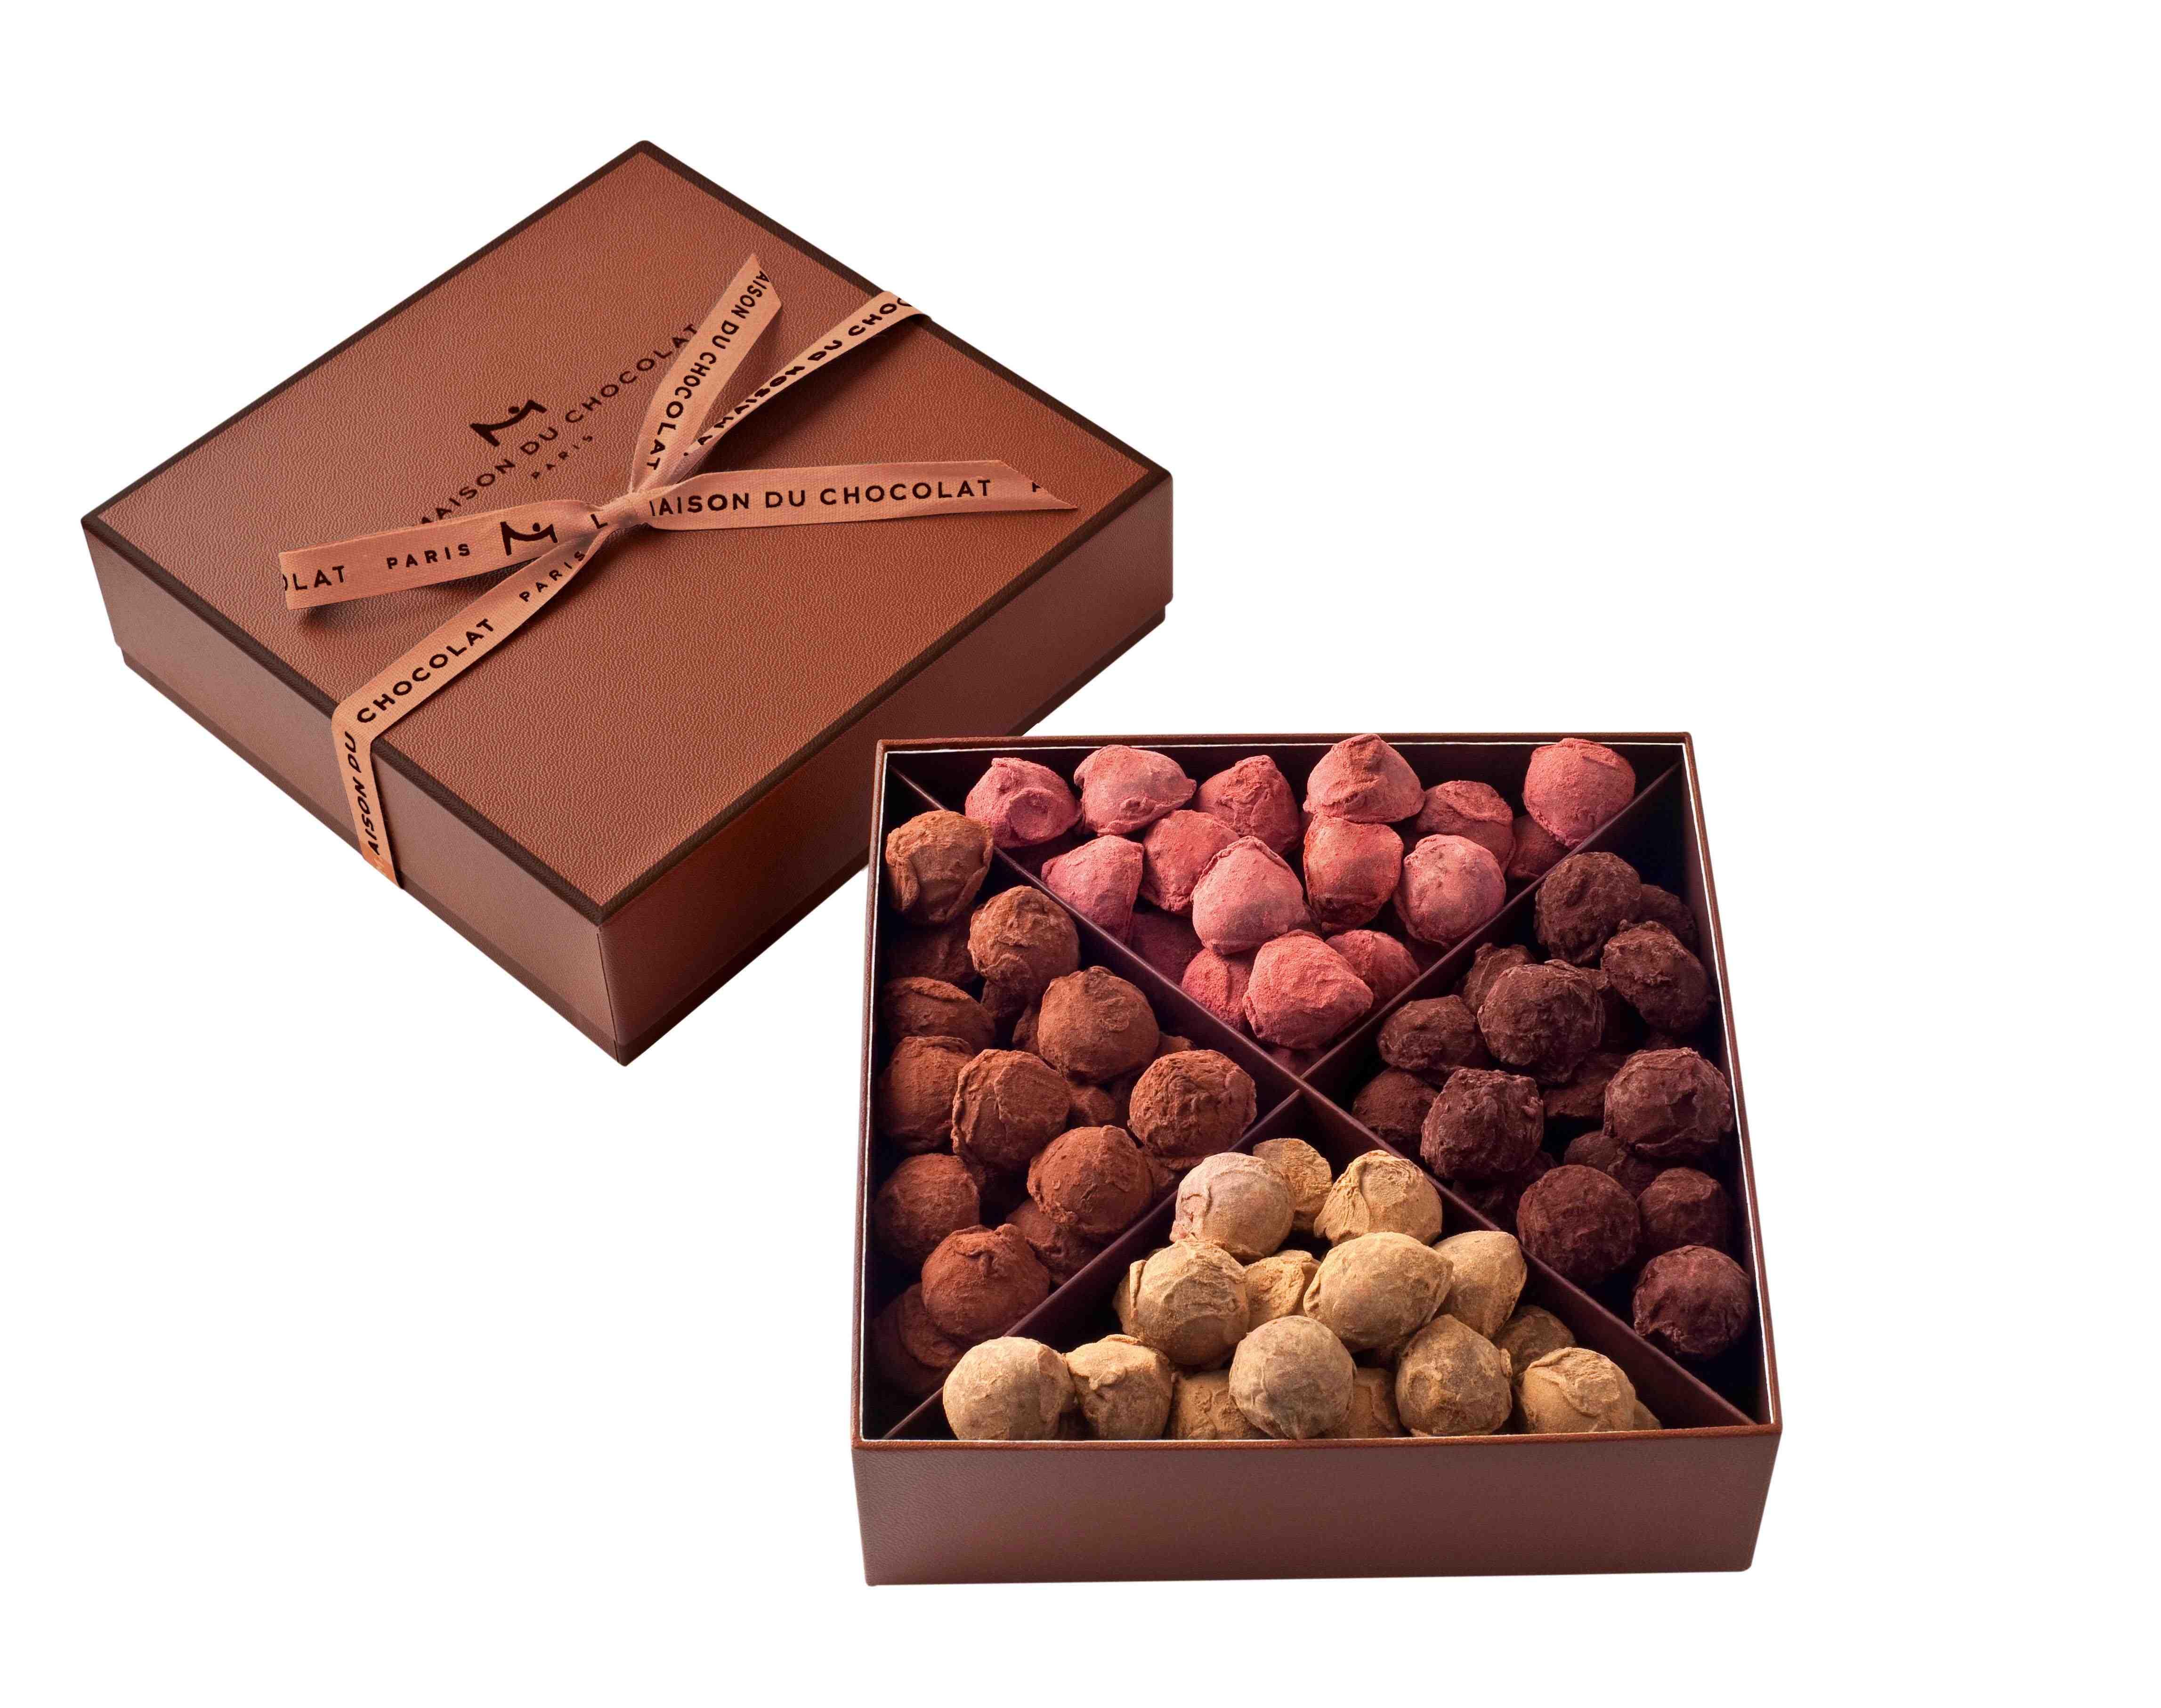 Robert Linxe's Chocolate Truffles (La Maison du Chocolat)